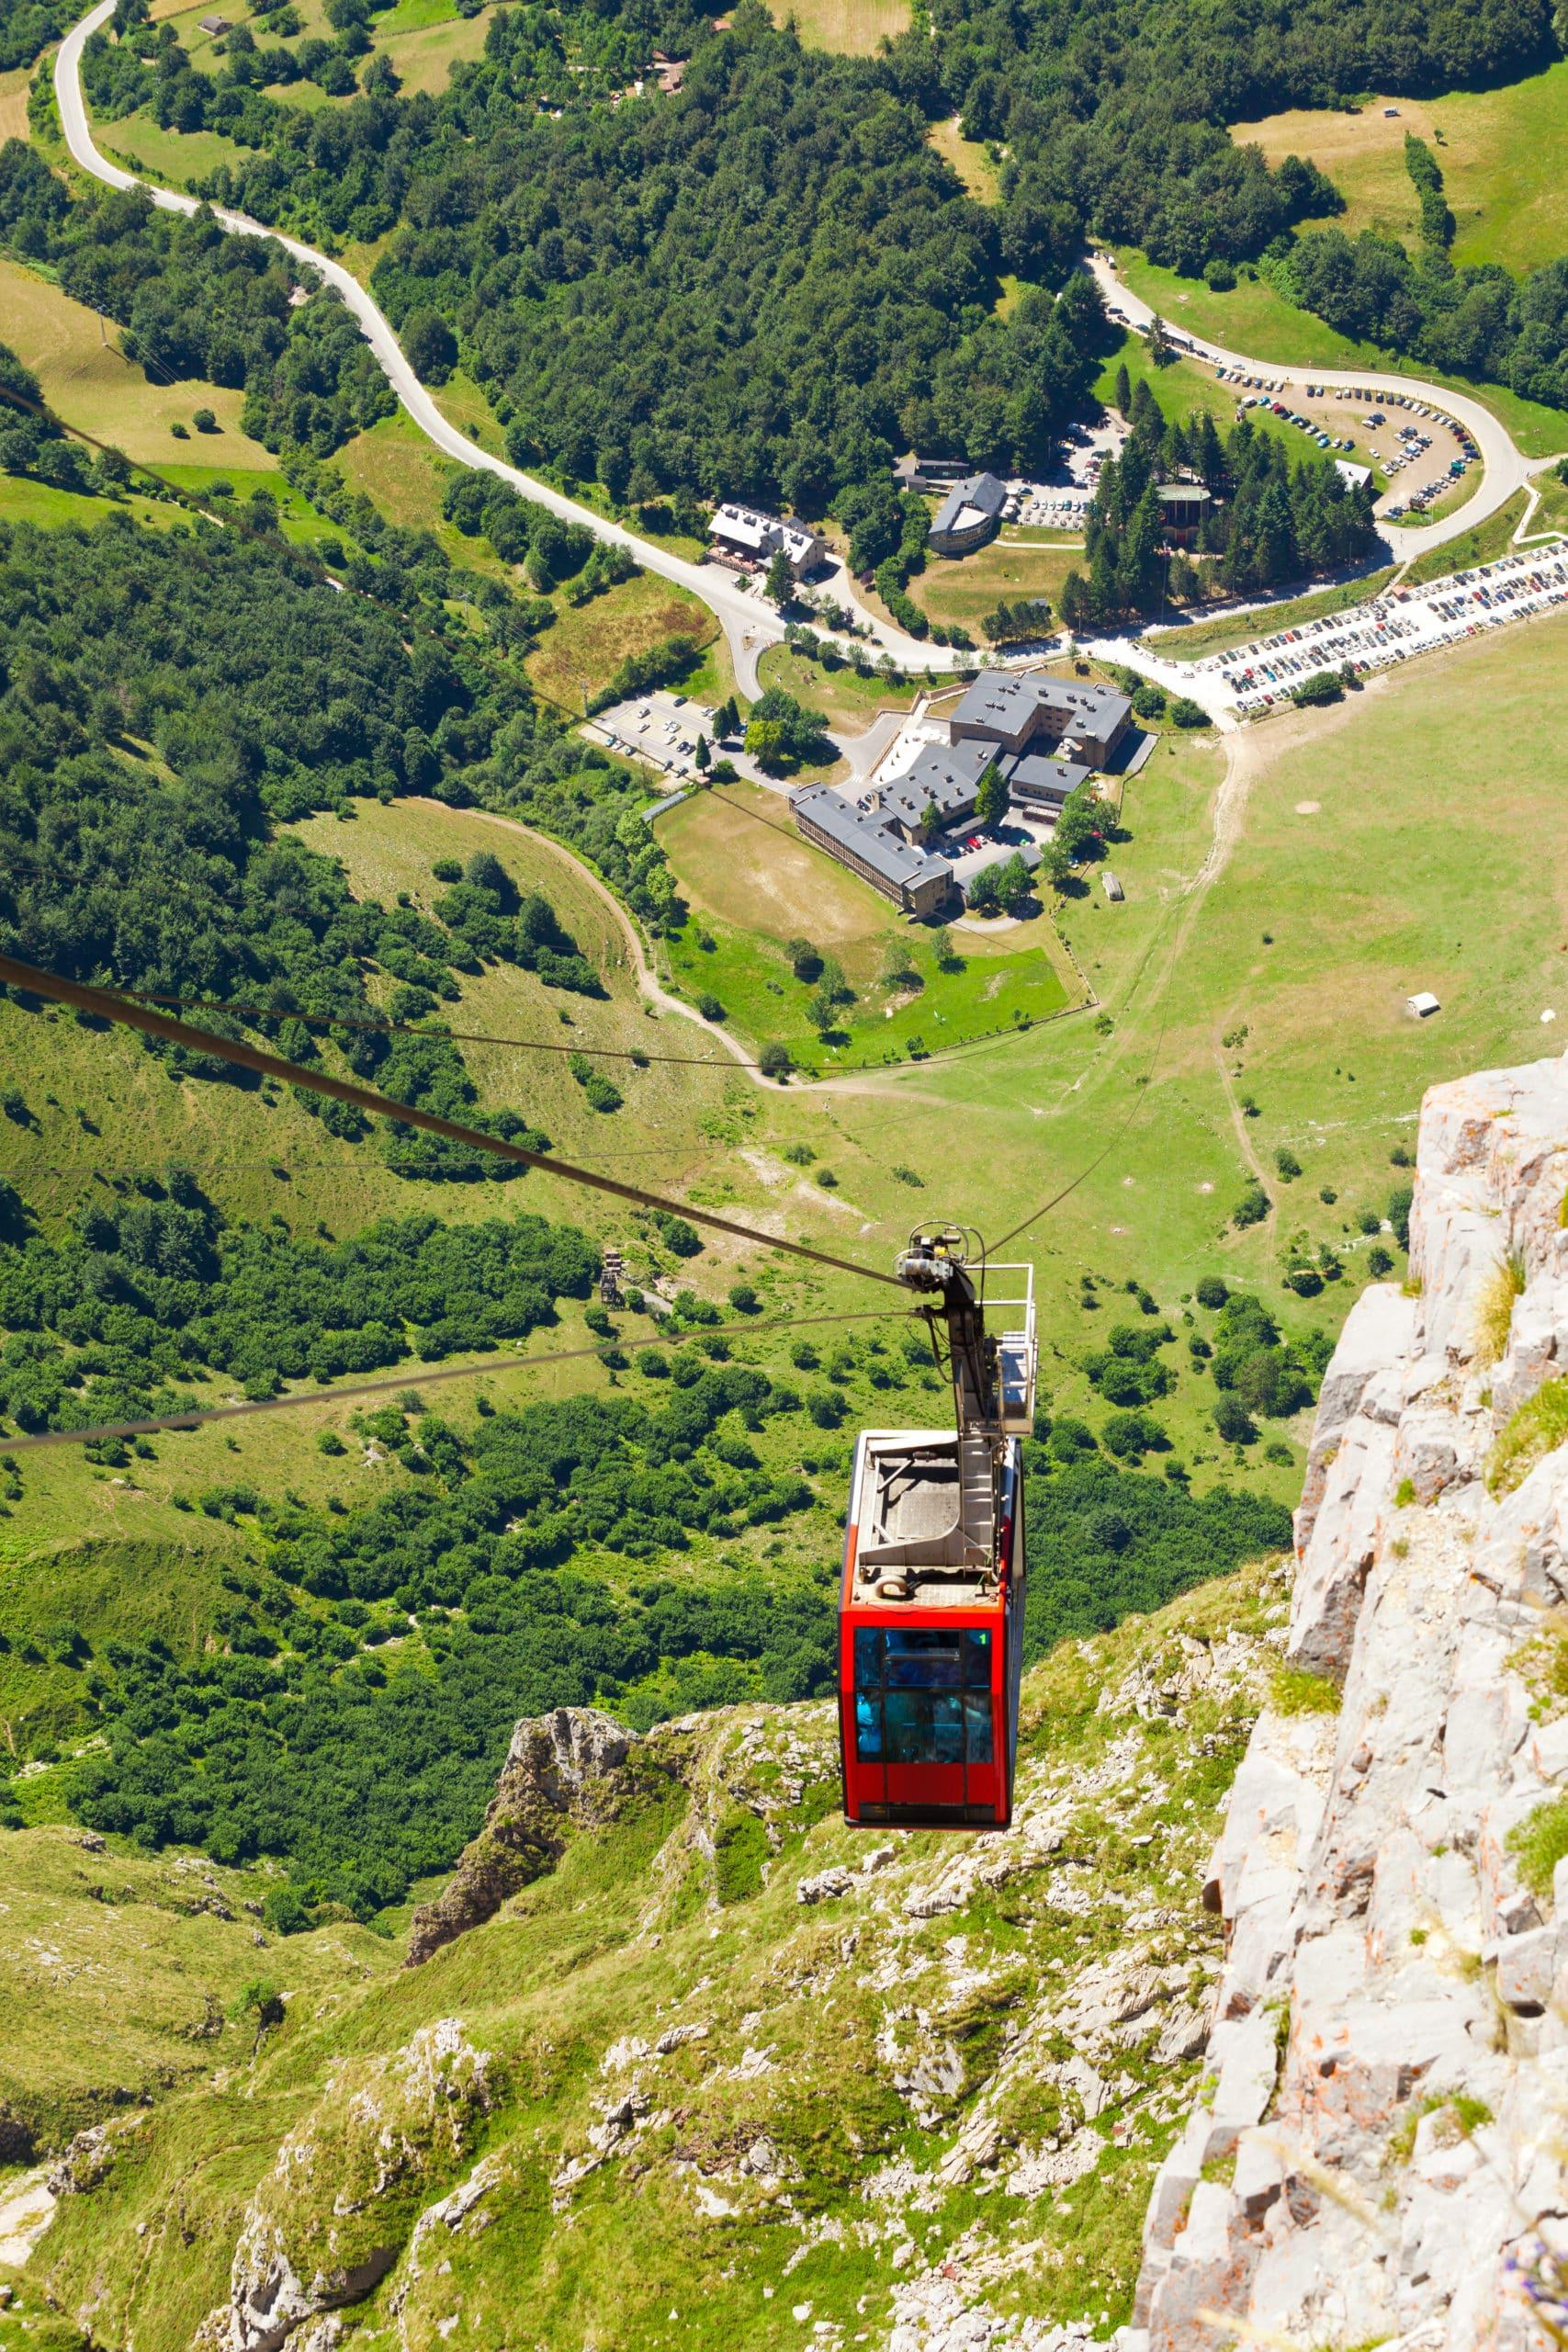 Fuente Dé clable railway. Picos de Europa, Cantabria, Spain